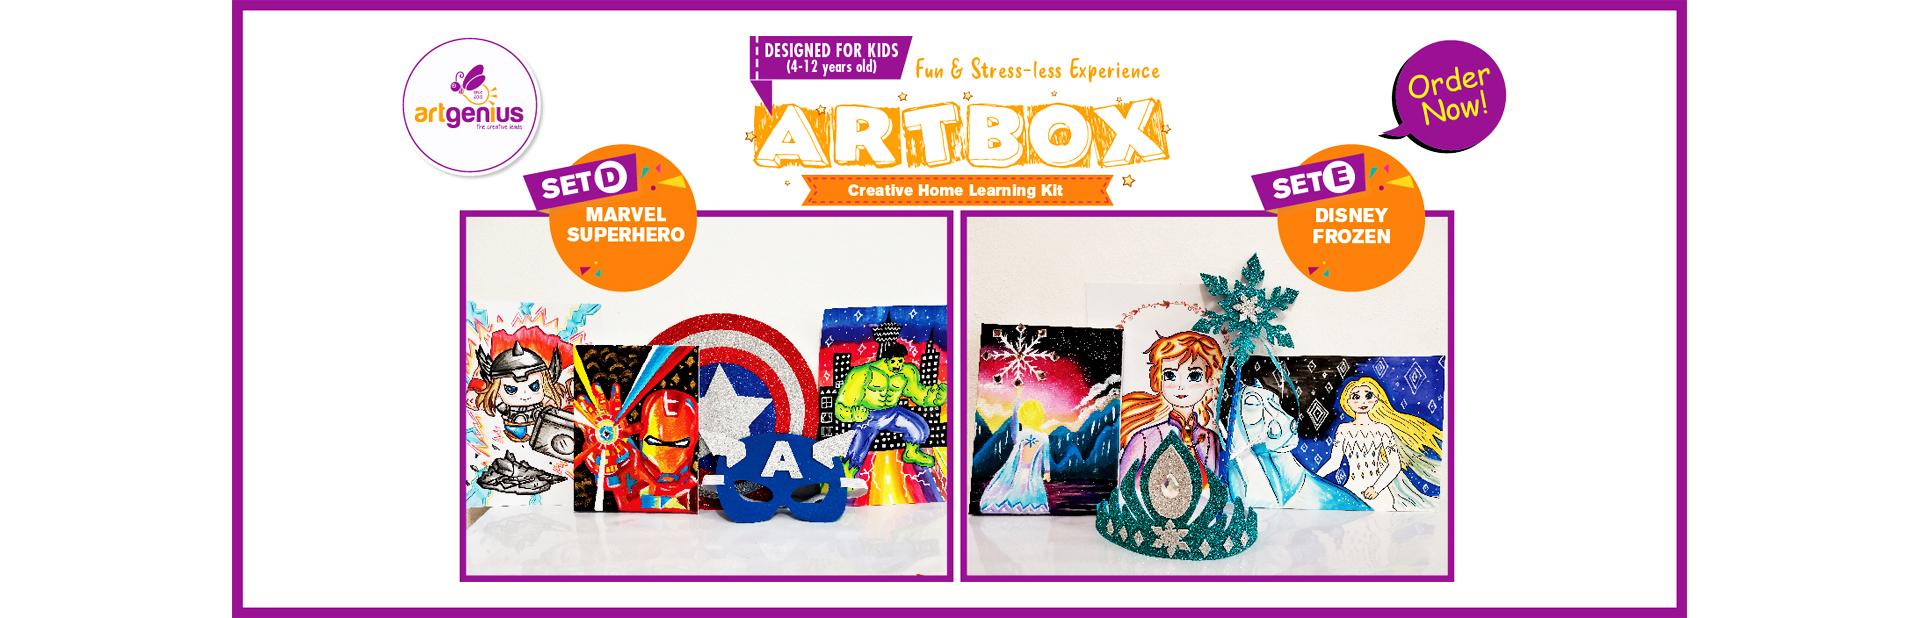 Artbox-web-banner-2